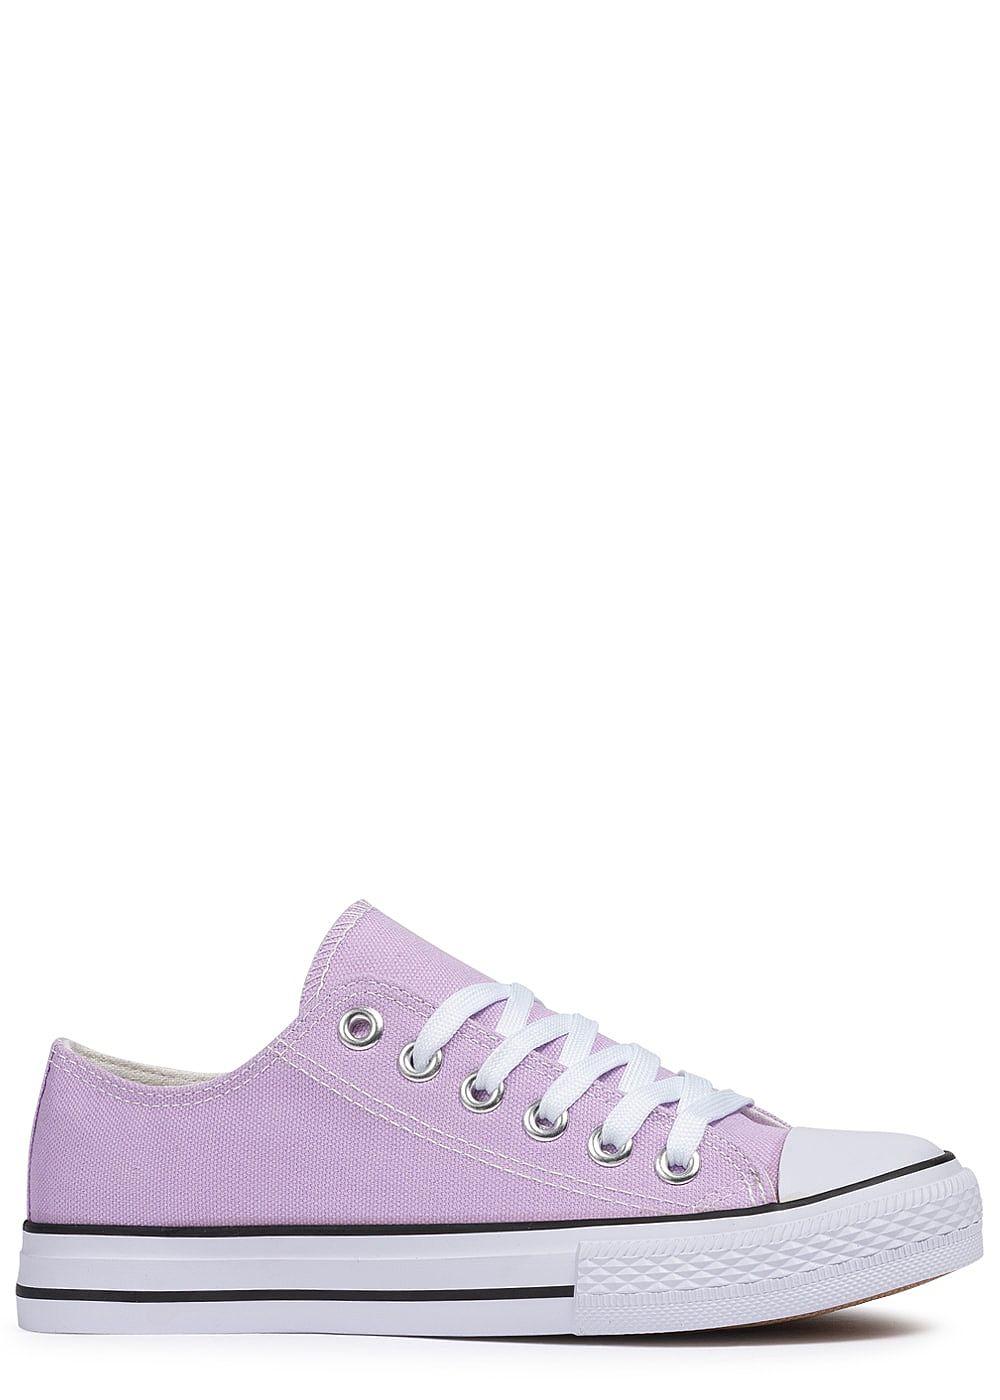 1c143091e3c513 Seventyseven Lifestyle Damen Schuh Canvas-Sneaker lila - 77onlineshop